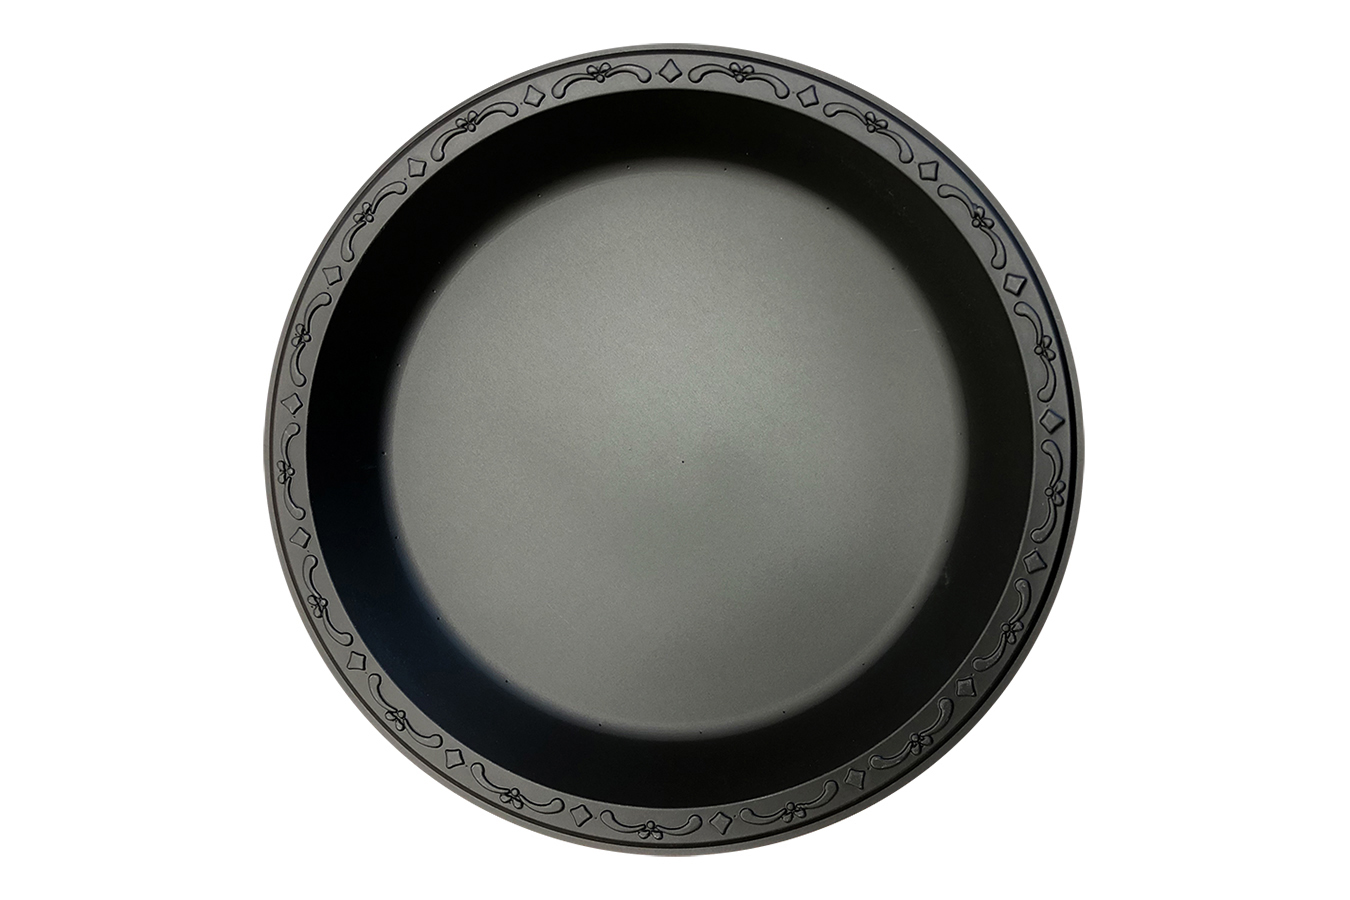 Black Polypropylene PP Plastic round 10 inches pebble box plate